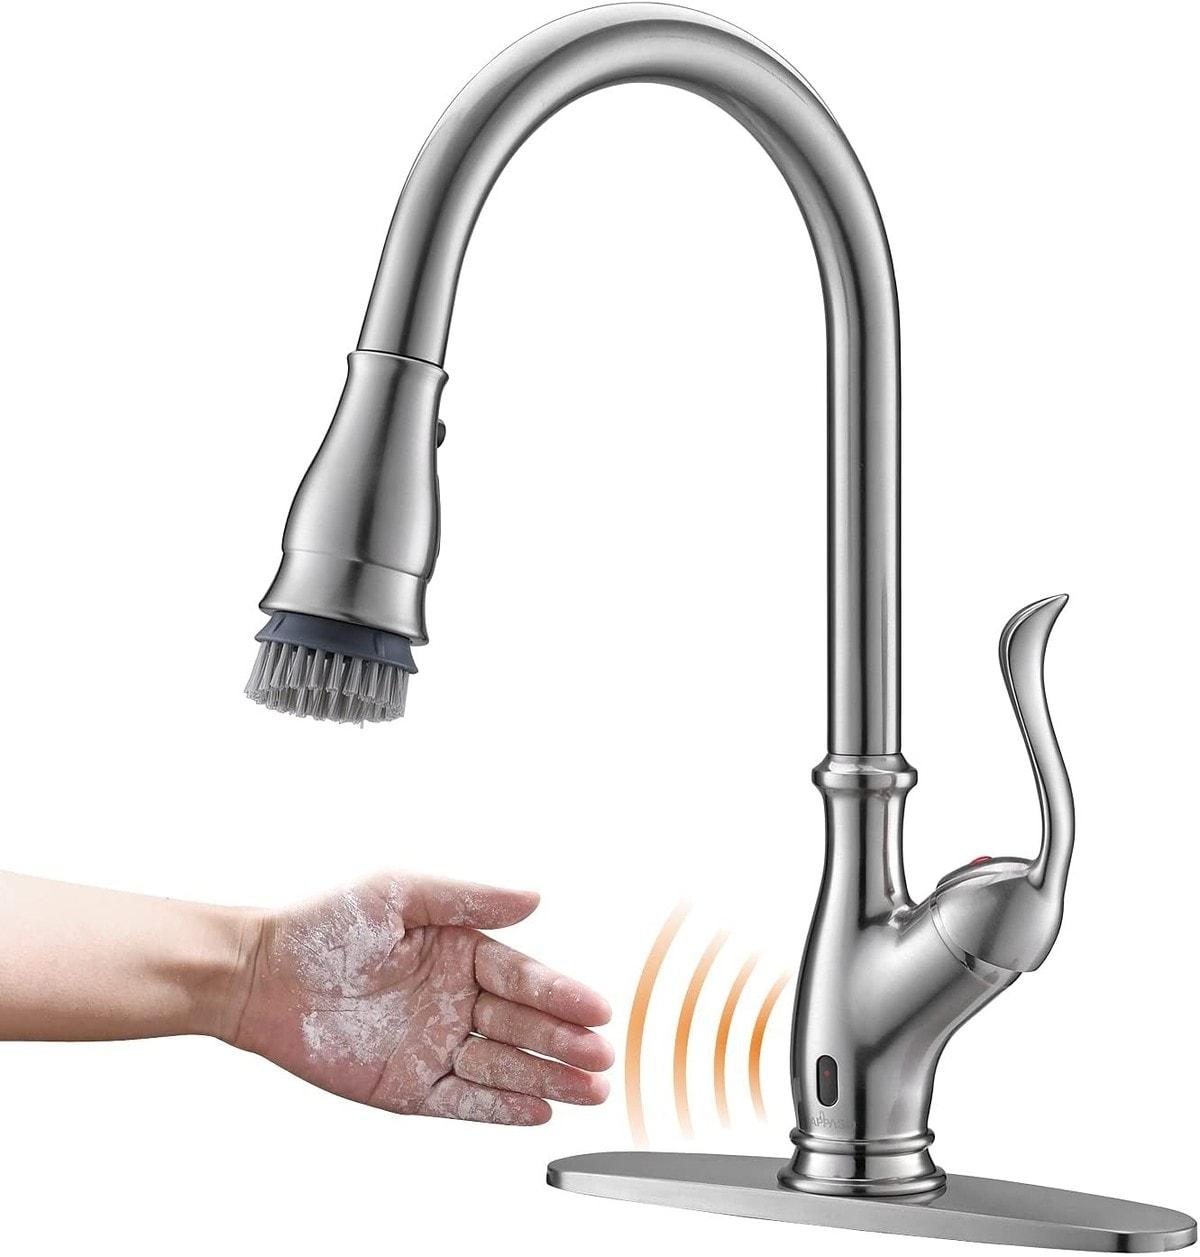 APPASO Touchless Kitchen Faucet